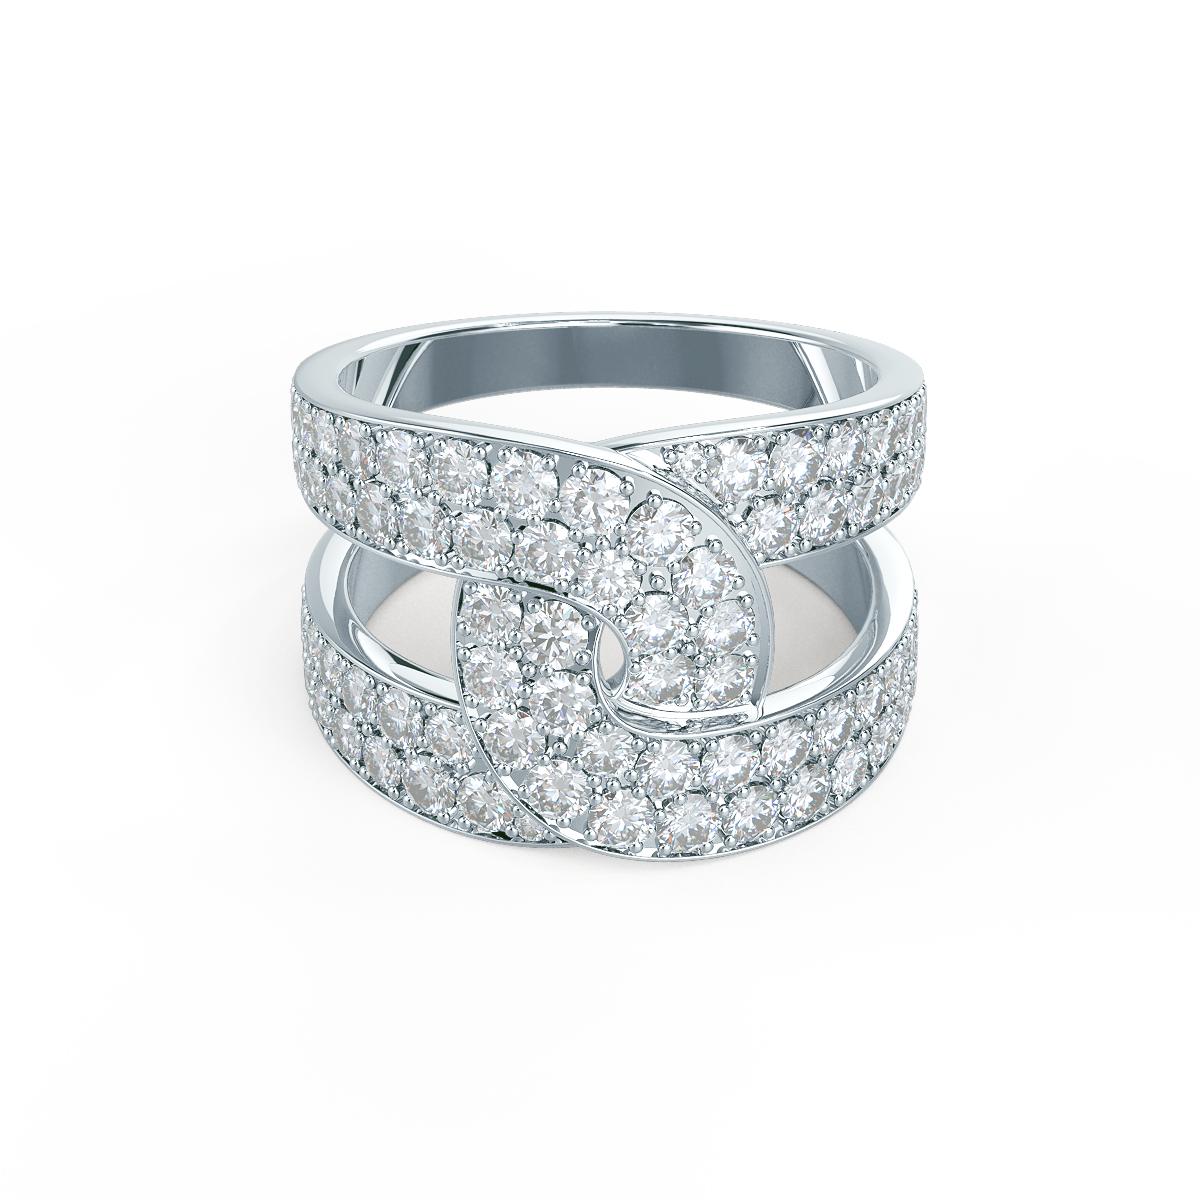 Lab grown diamond fashion ring with interlocking bands